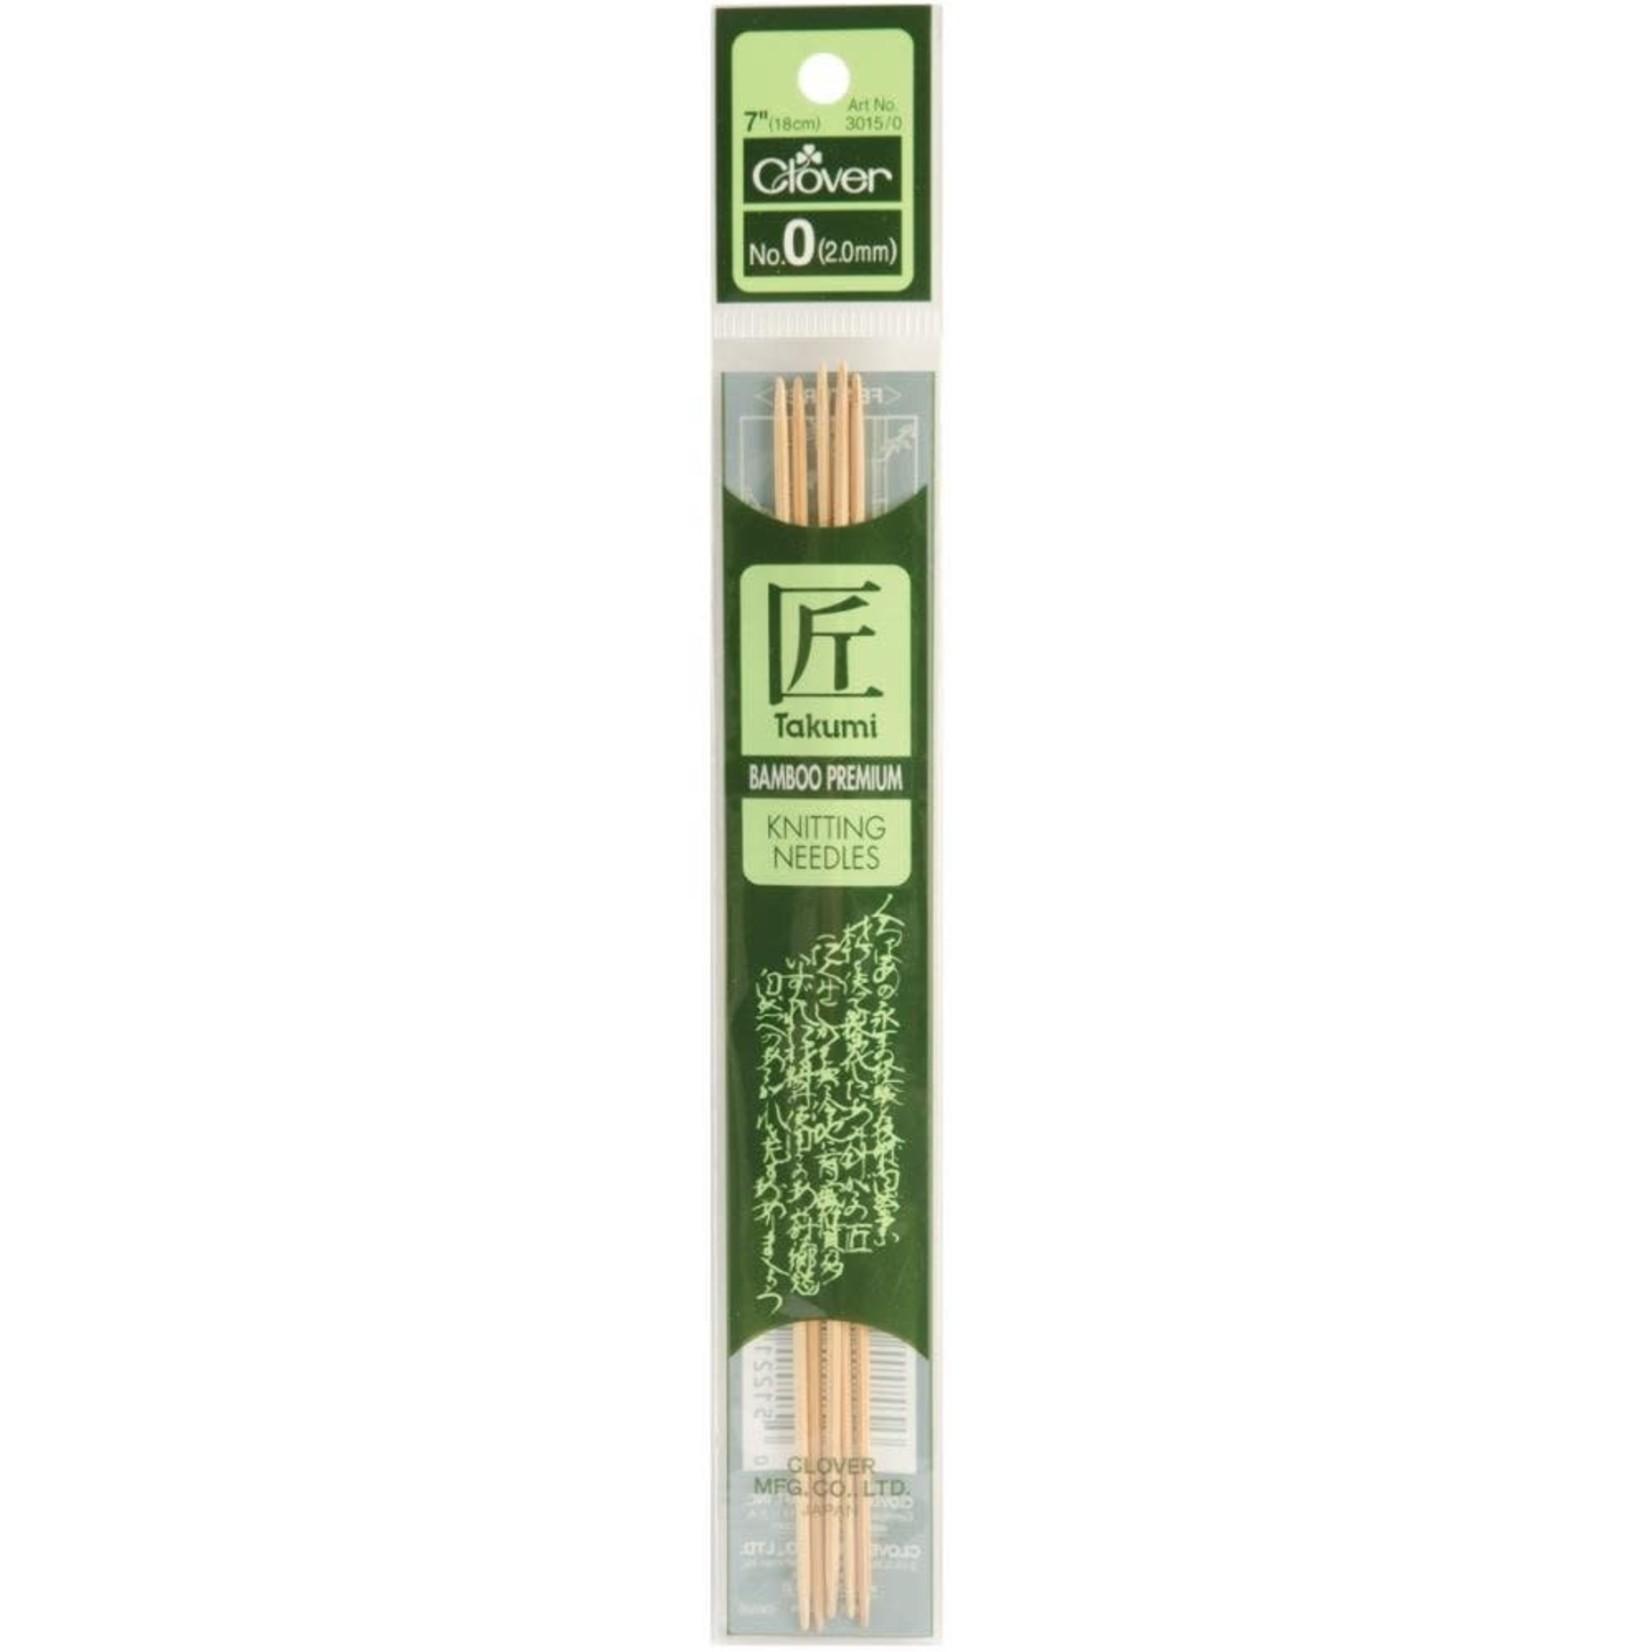 "Takumi Takumi Bamboo Double Point 18cm (7"") Knitting Needles"